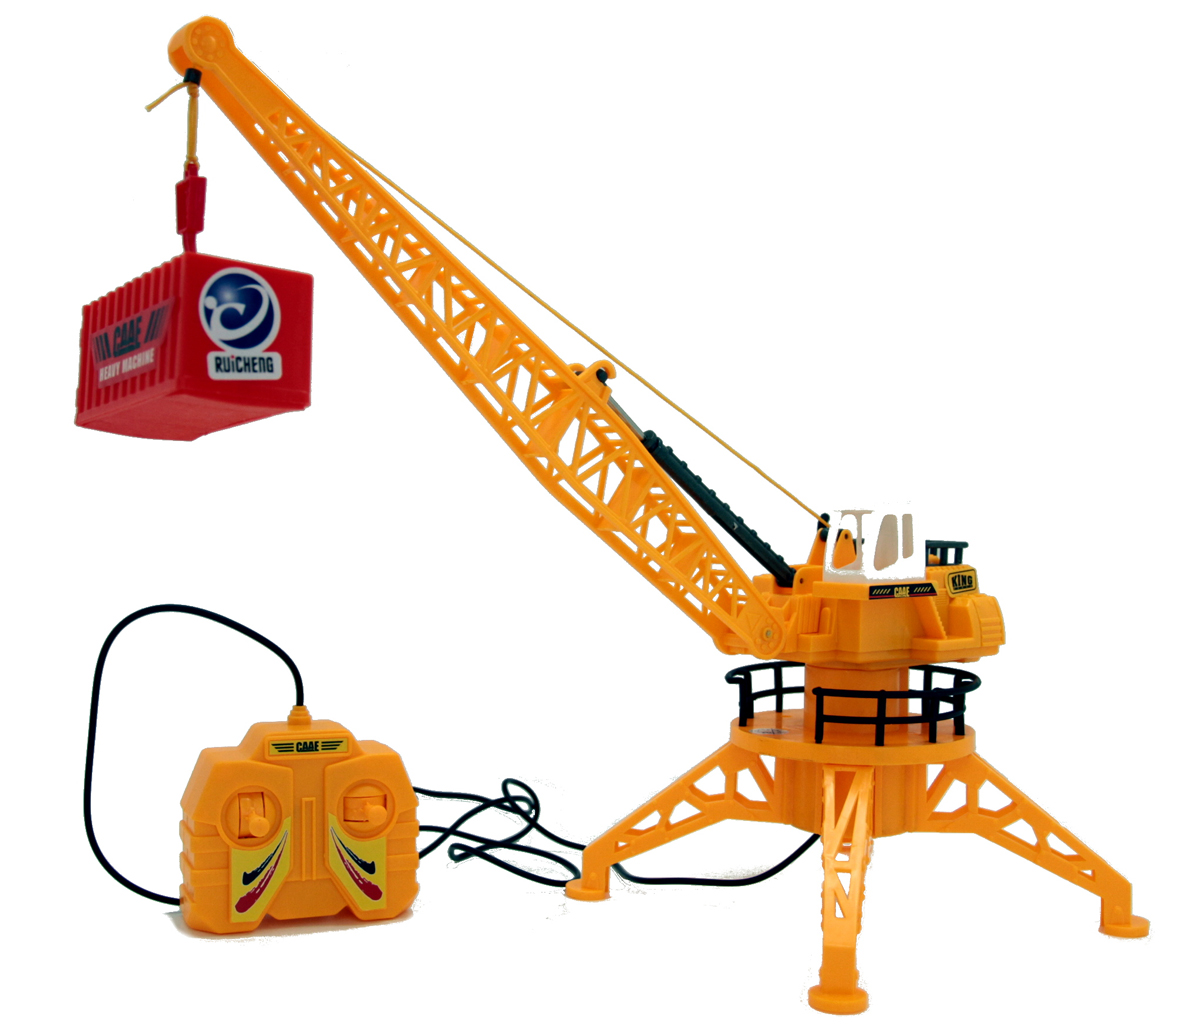 Balbi Кран на дистанционном управлении A0G1082874 - Транспорт, машинки